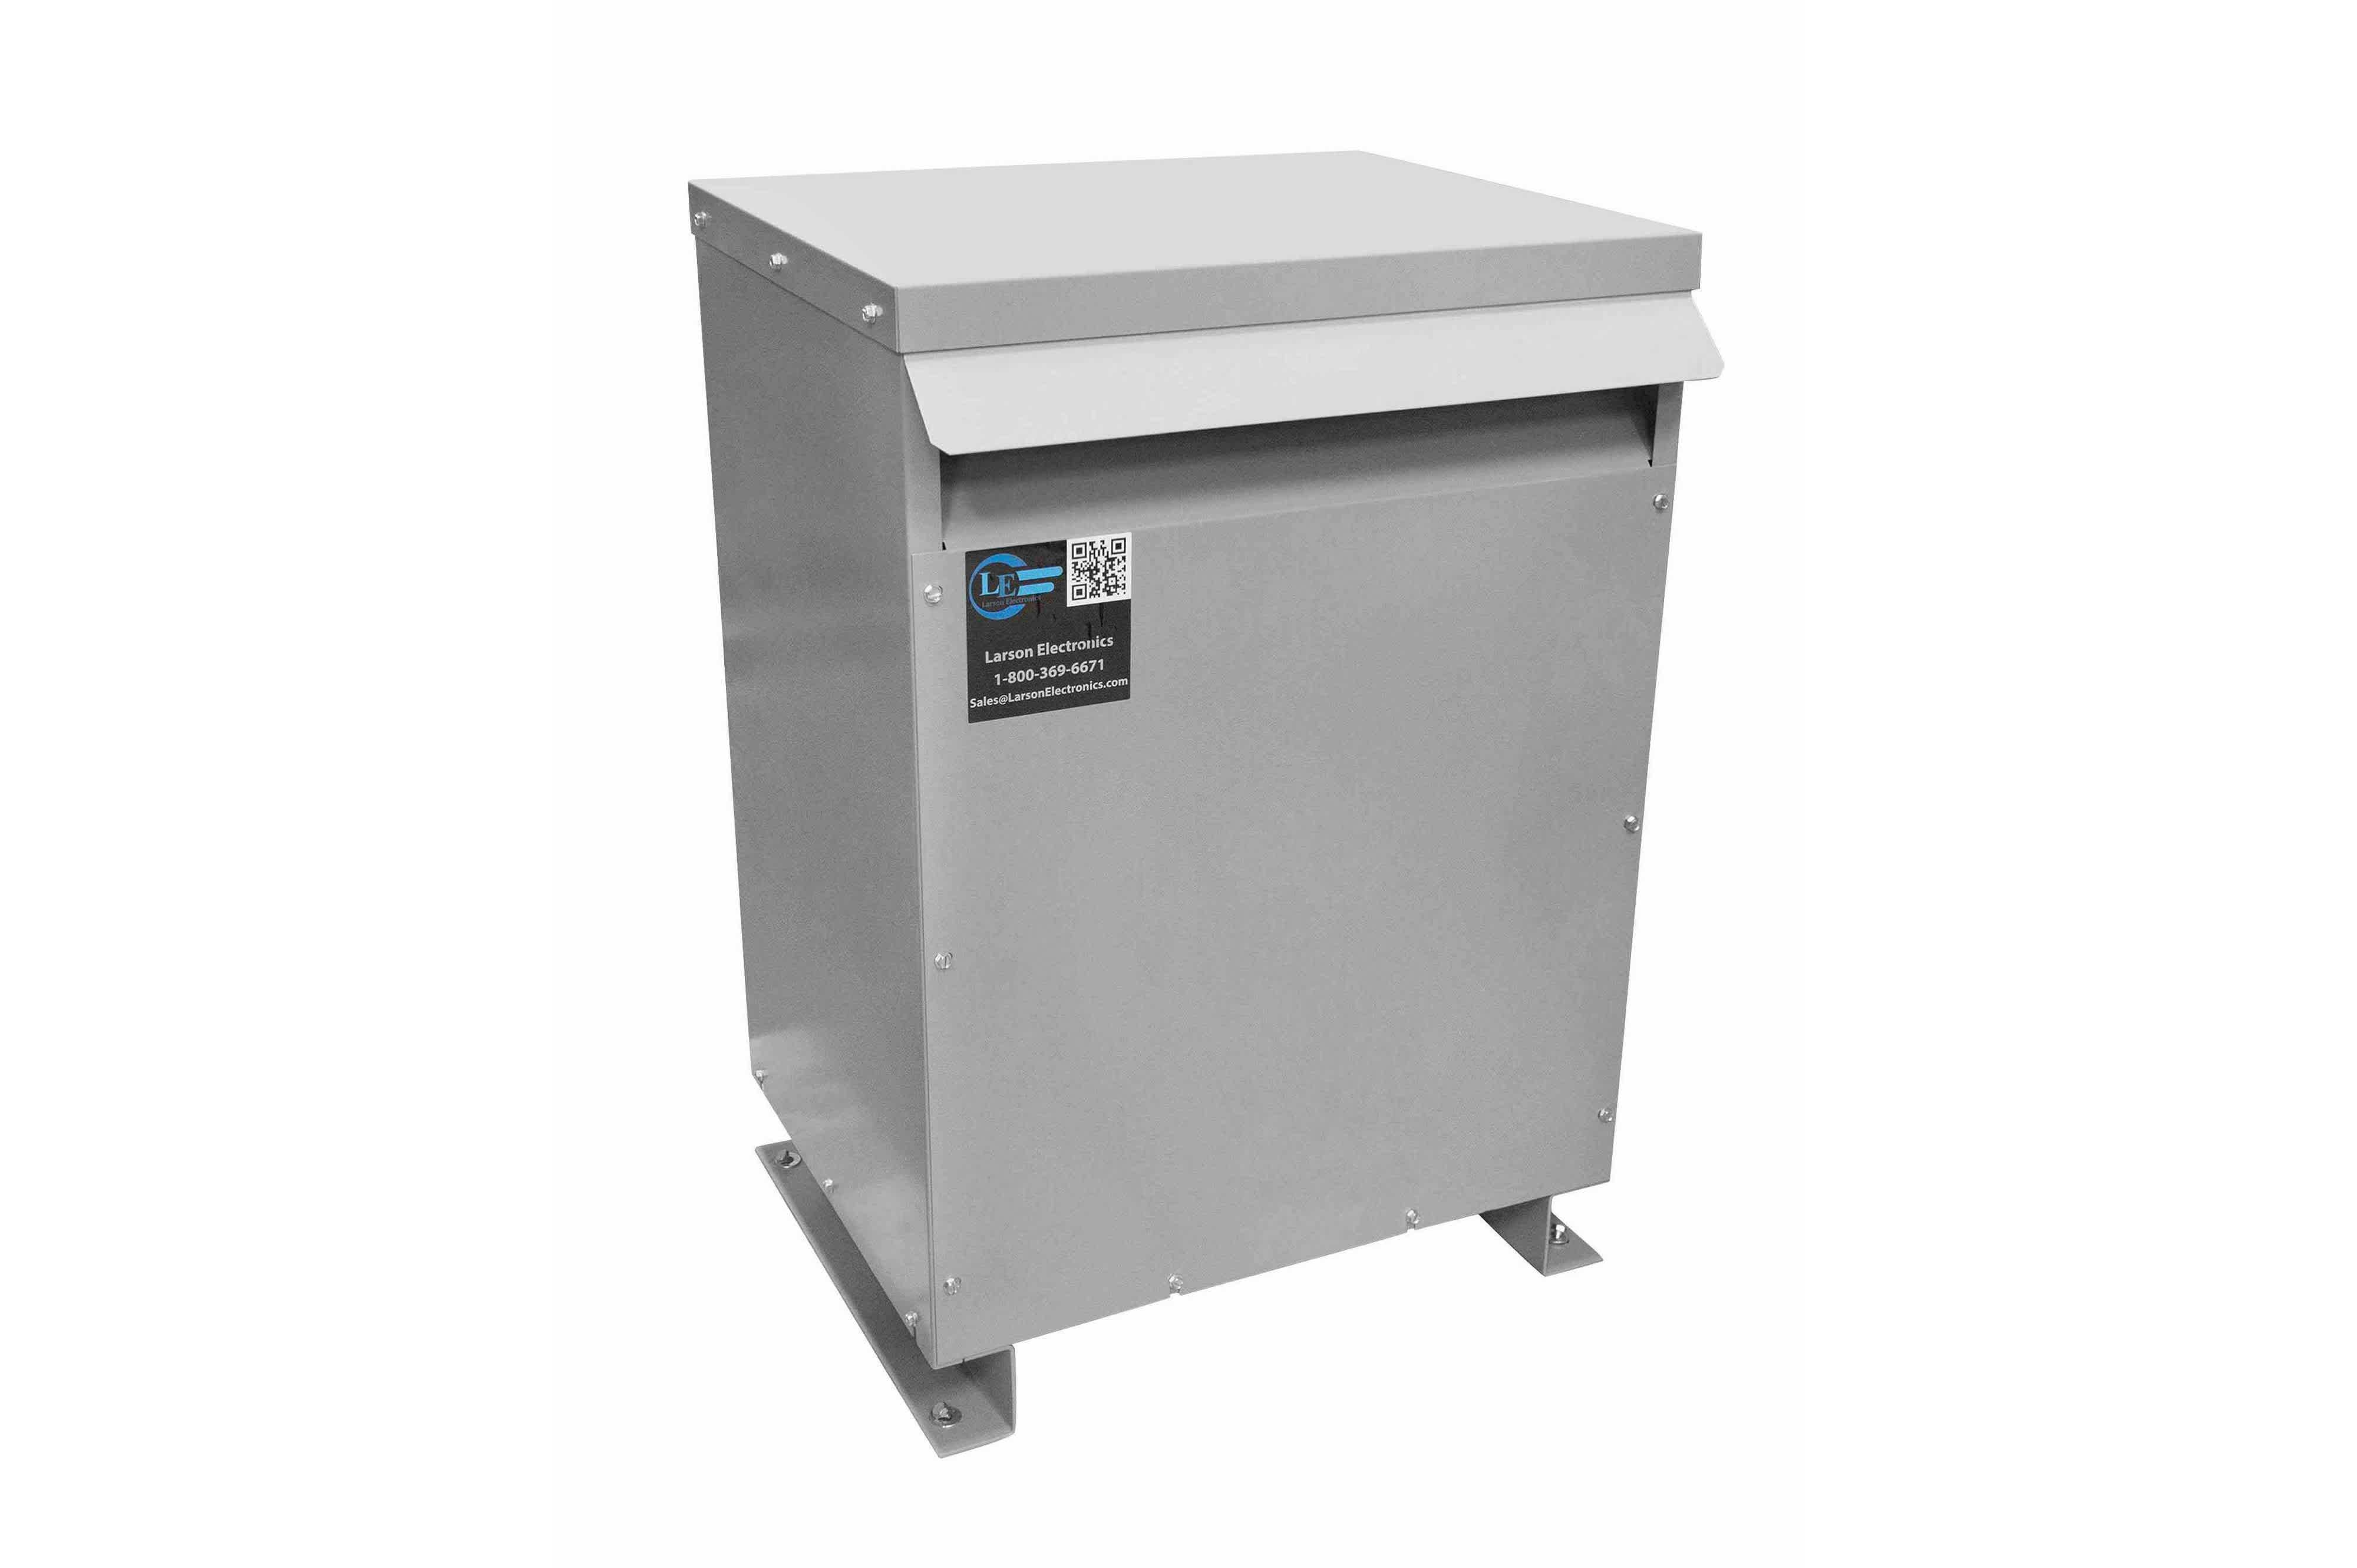 75 kVA 3PH Isolation Transformer, 230V Wye Primary, 208V Delta Secondary, N3R, Ventilated, 60 Hz